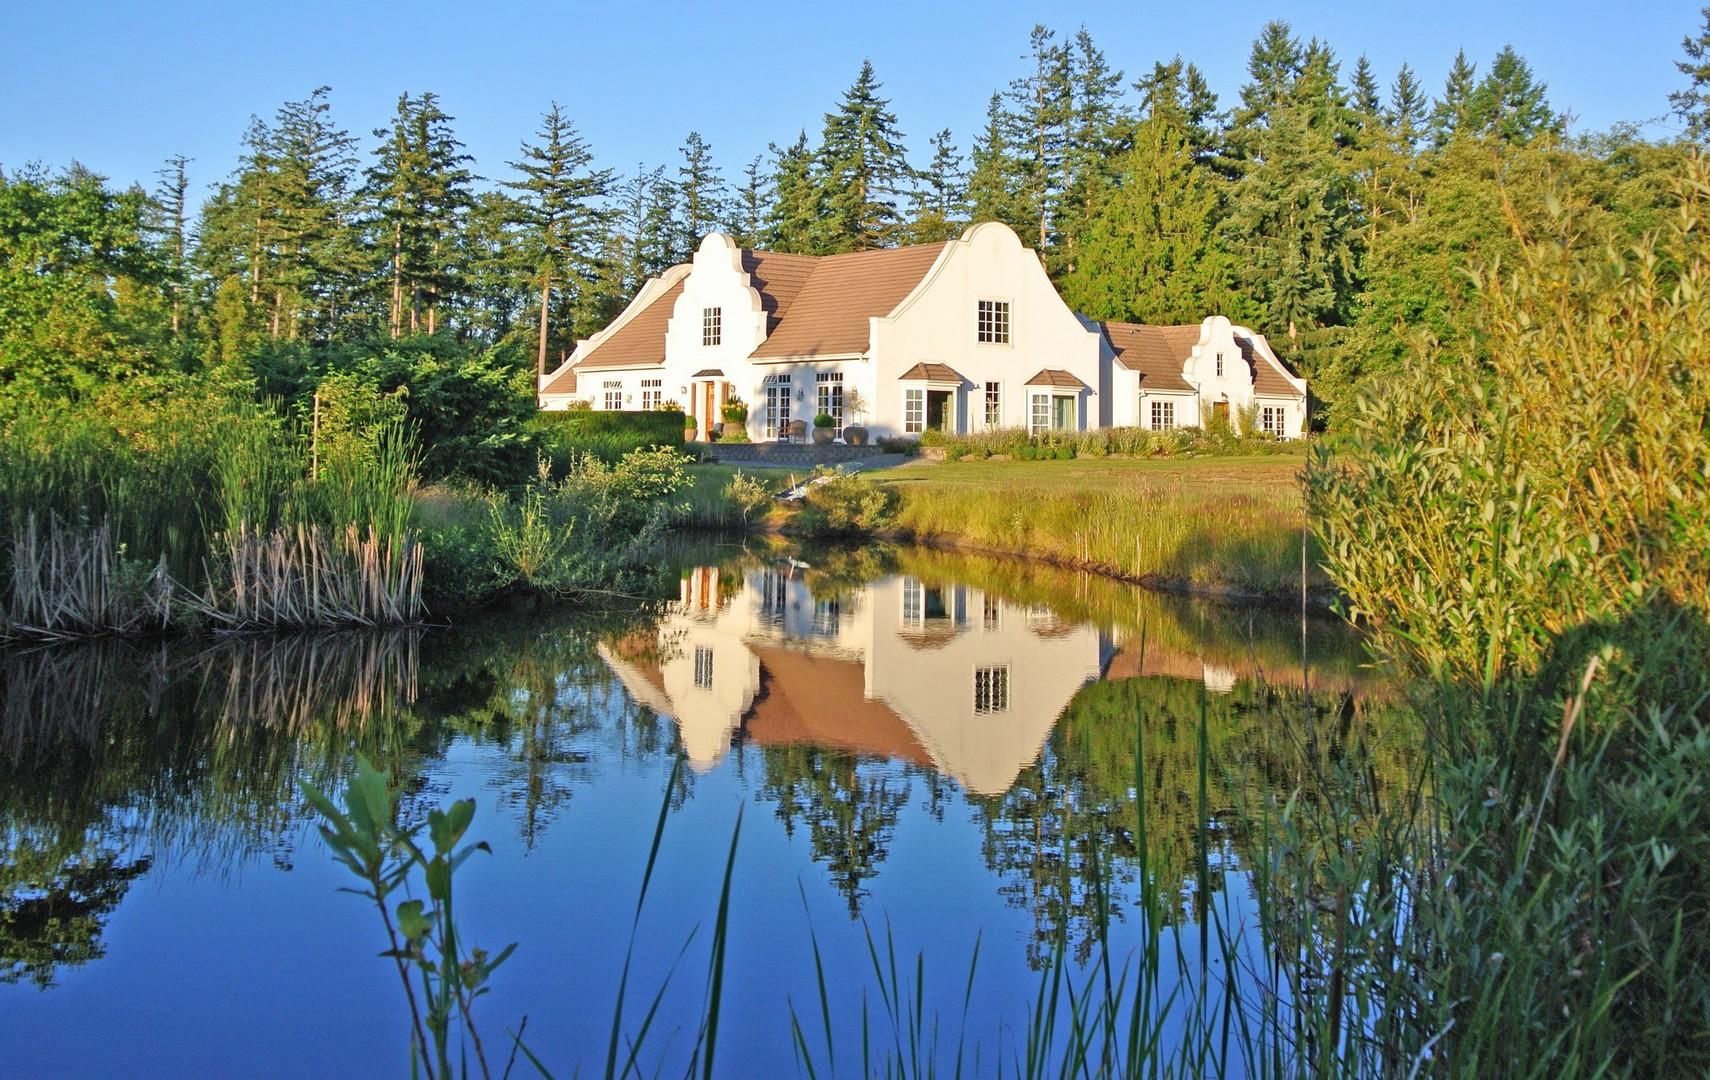 Single Family Home for Sale at Cape Dutch Masterpiece 14365 Leslie Lane Mount Vernon, Washington 98273 United States